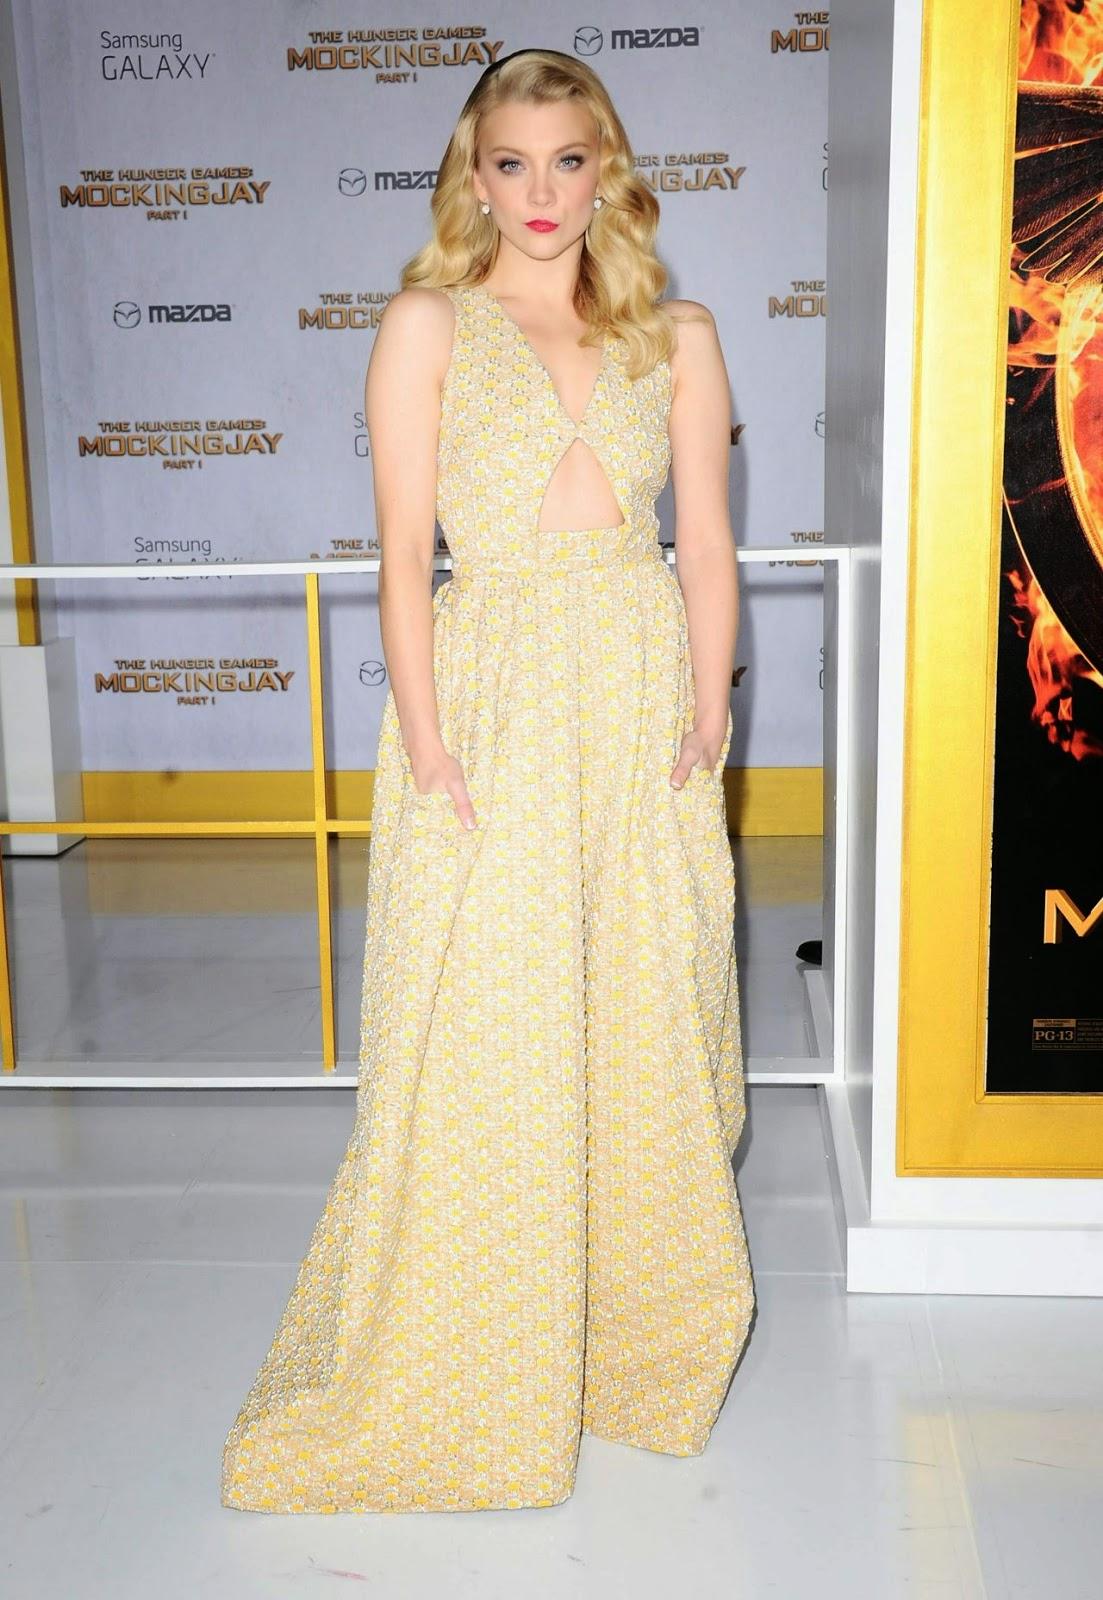 Natalie Dormer flaunts a Rochas gown at The Hunger Games: Mockingjay Part 1 LA premiere